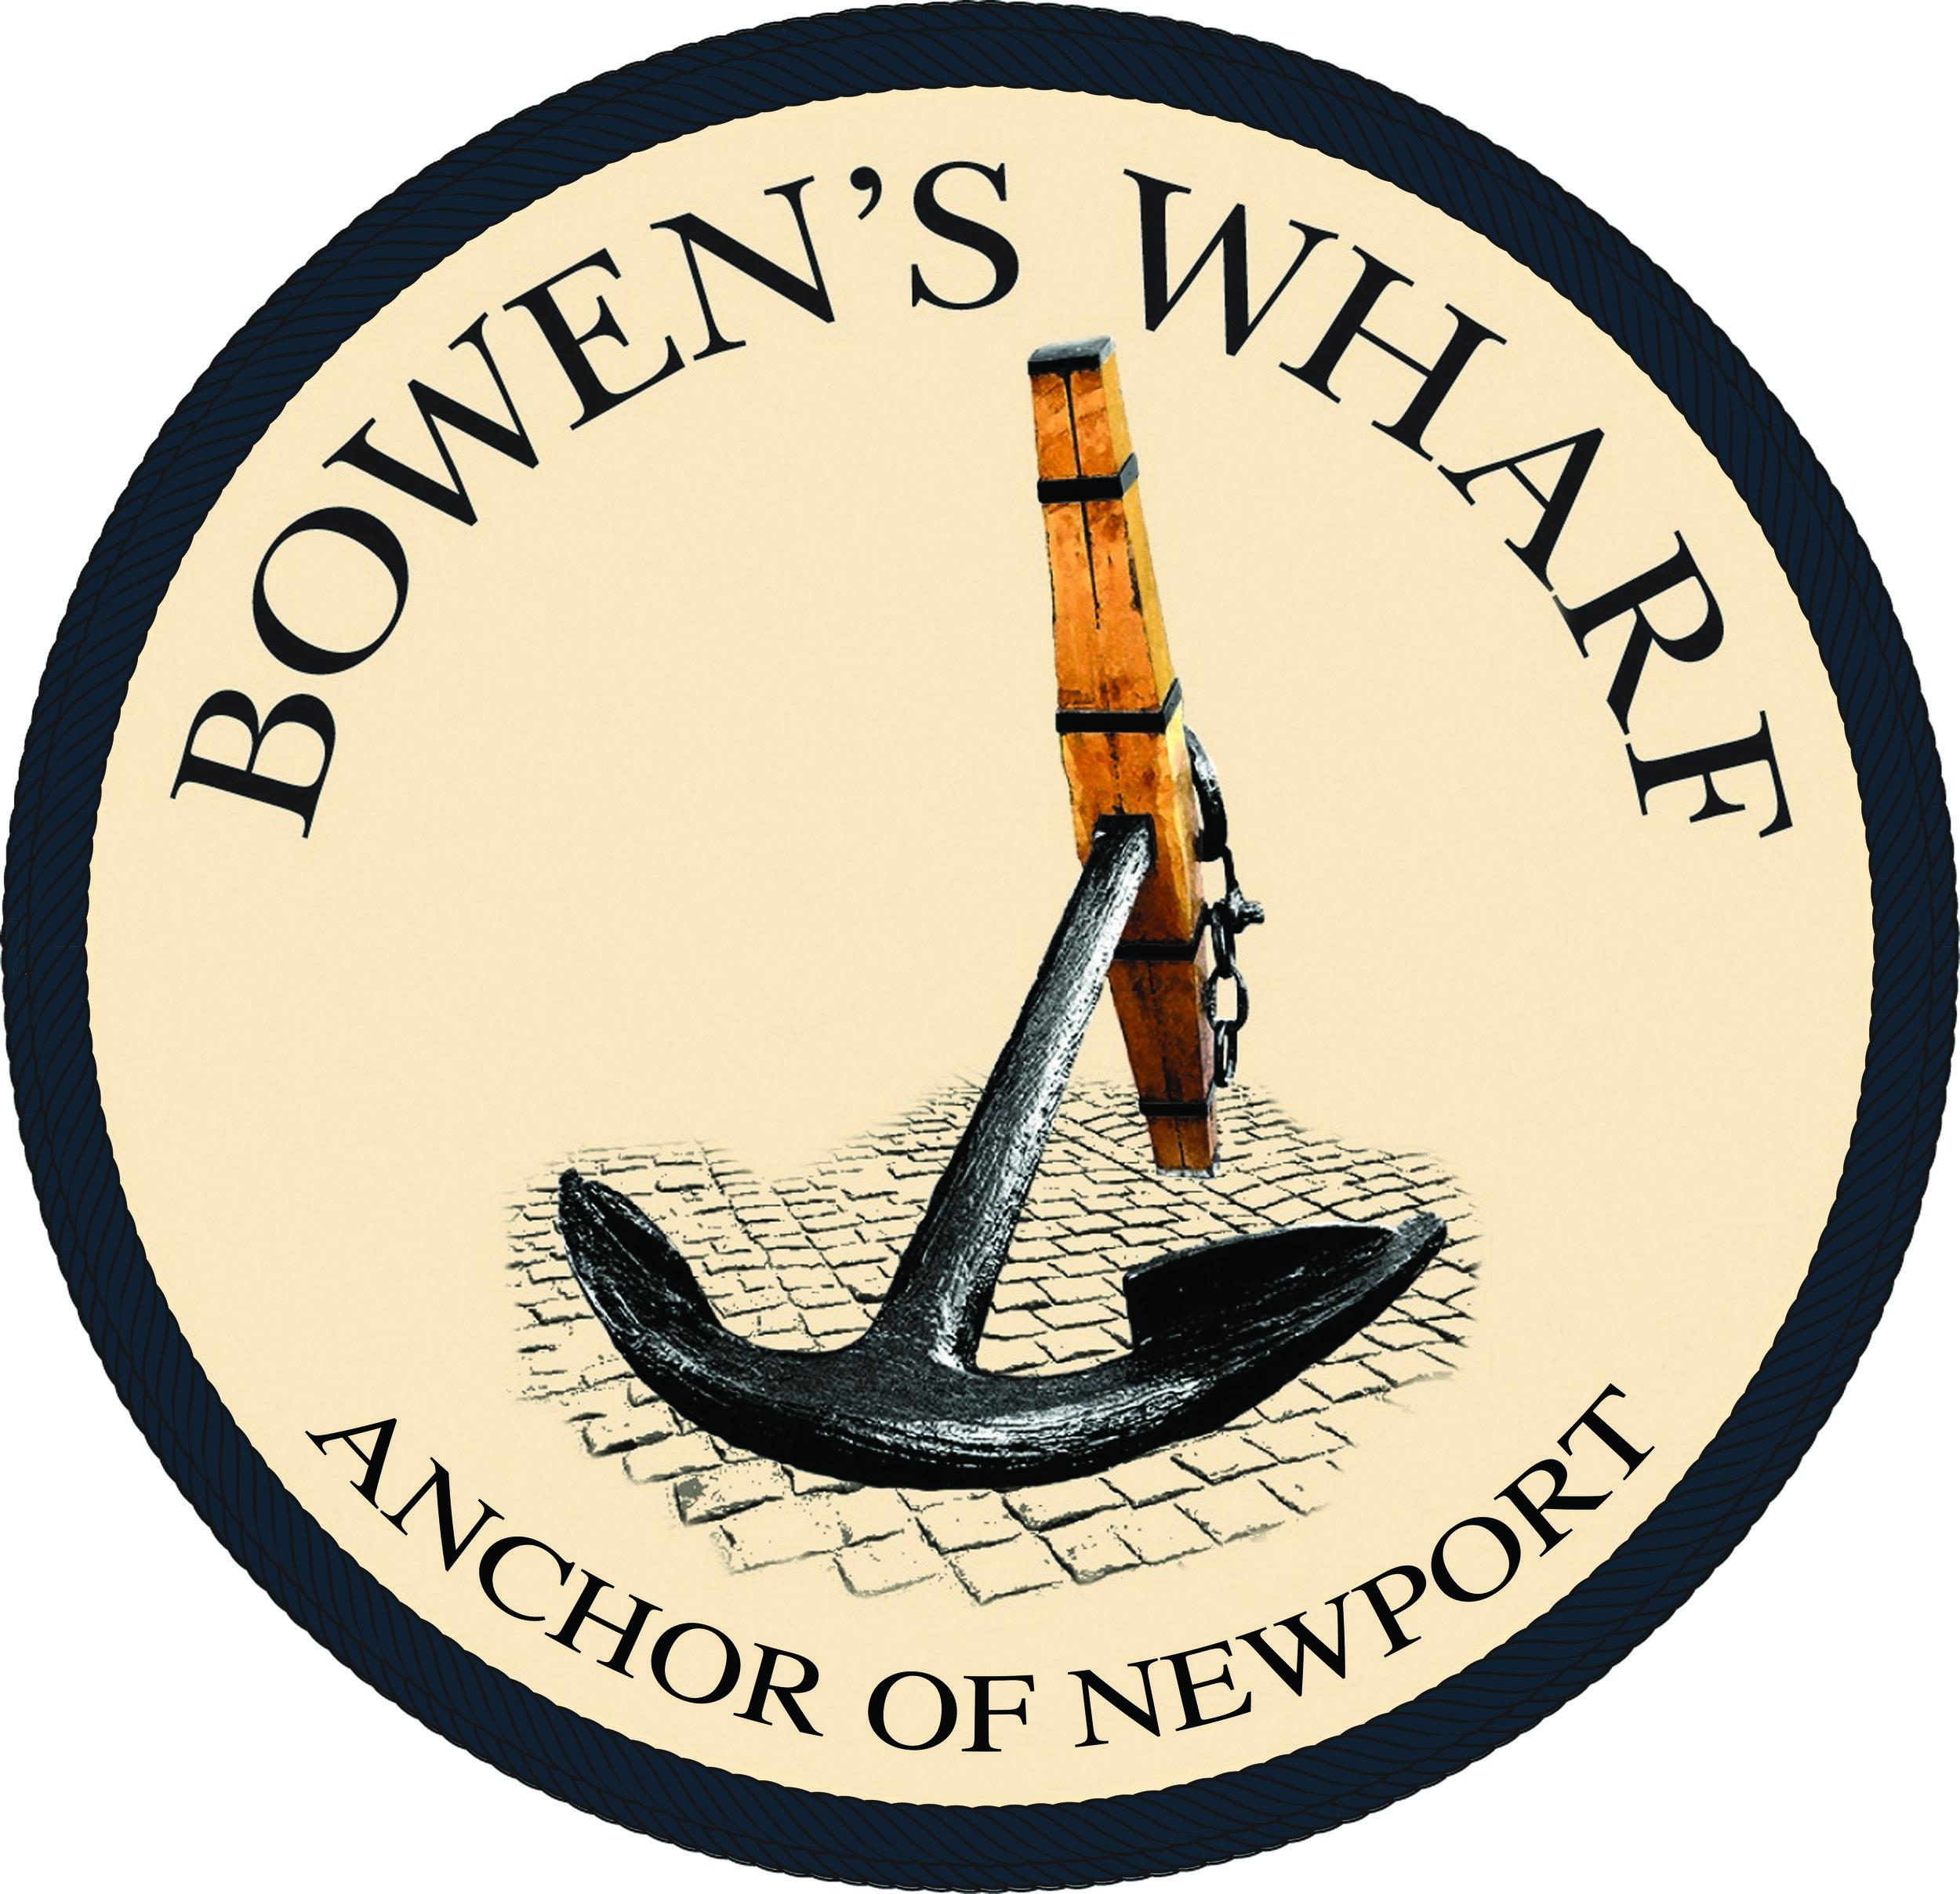 BW CMYK circle Anchor of Newport blackgreen rope.jpg